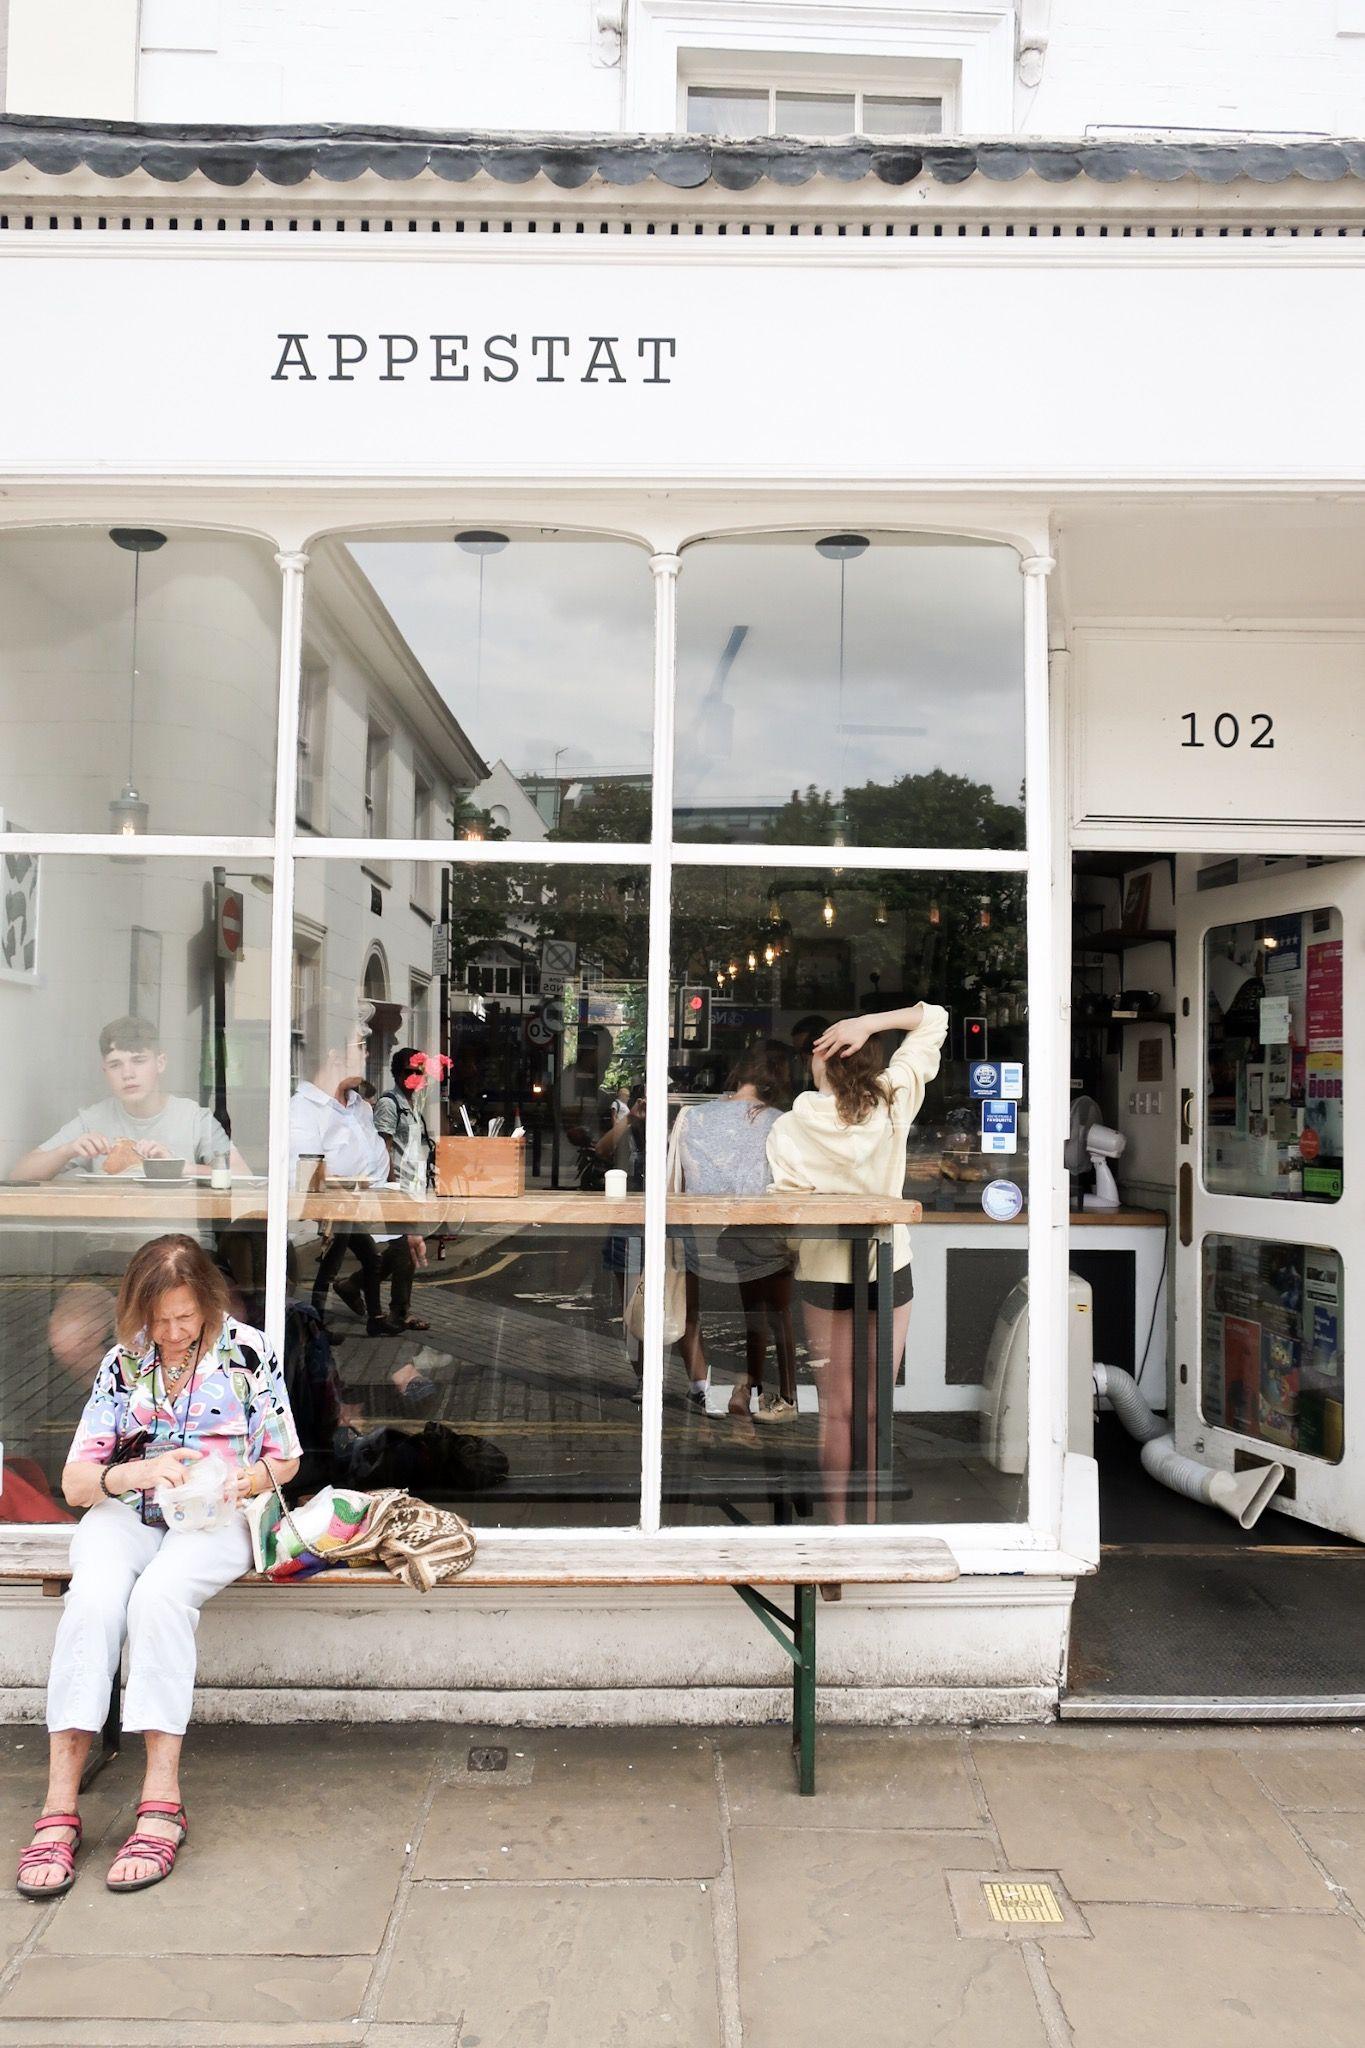 Appestat Cafe London Cafe, Full breakfast, Space place